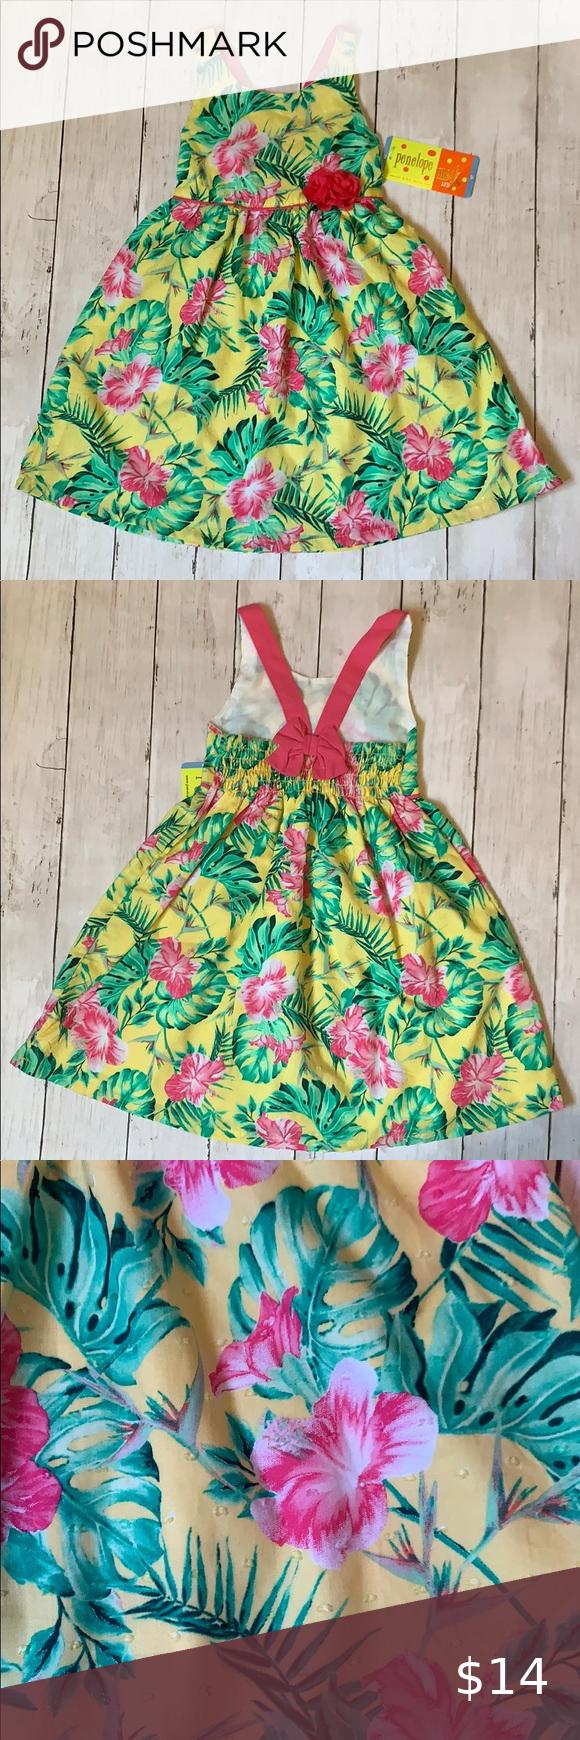 Penelope Mack Girls Dress 4t Girls Dresses Toddler Dress 2t Dress [ 1740 x 580 Pixel ]